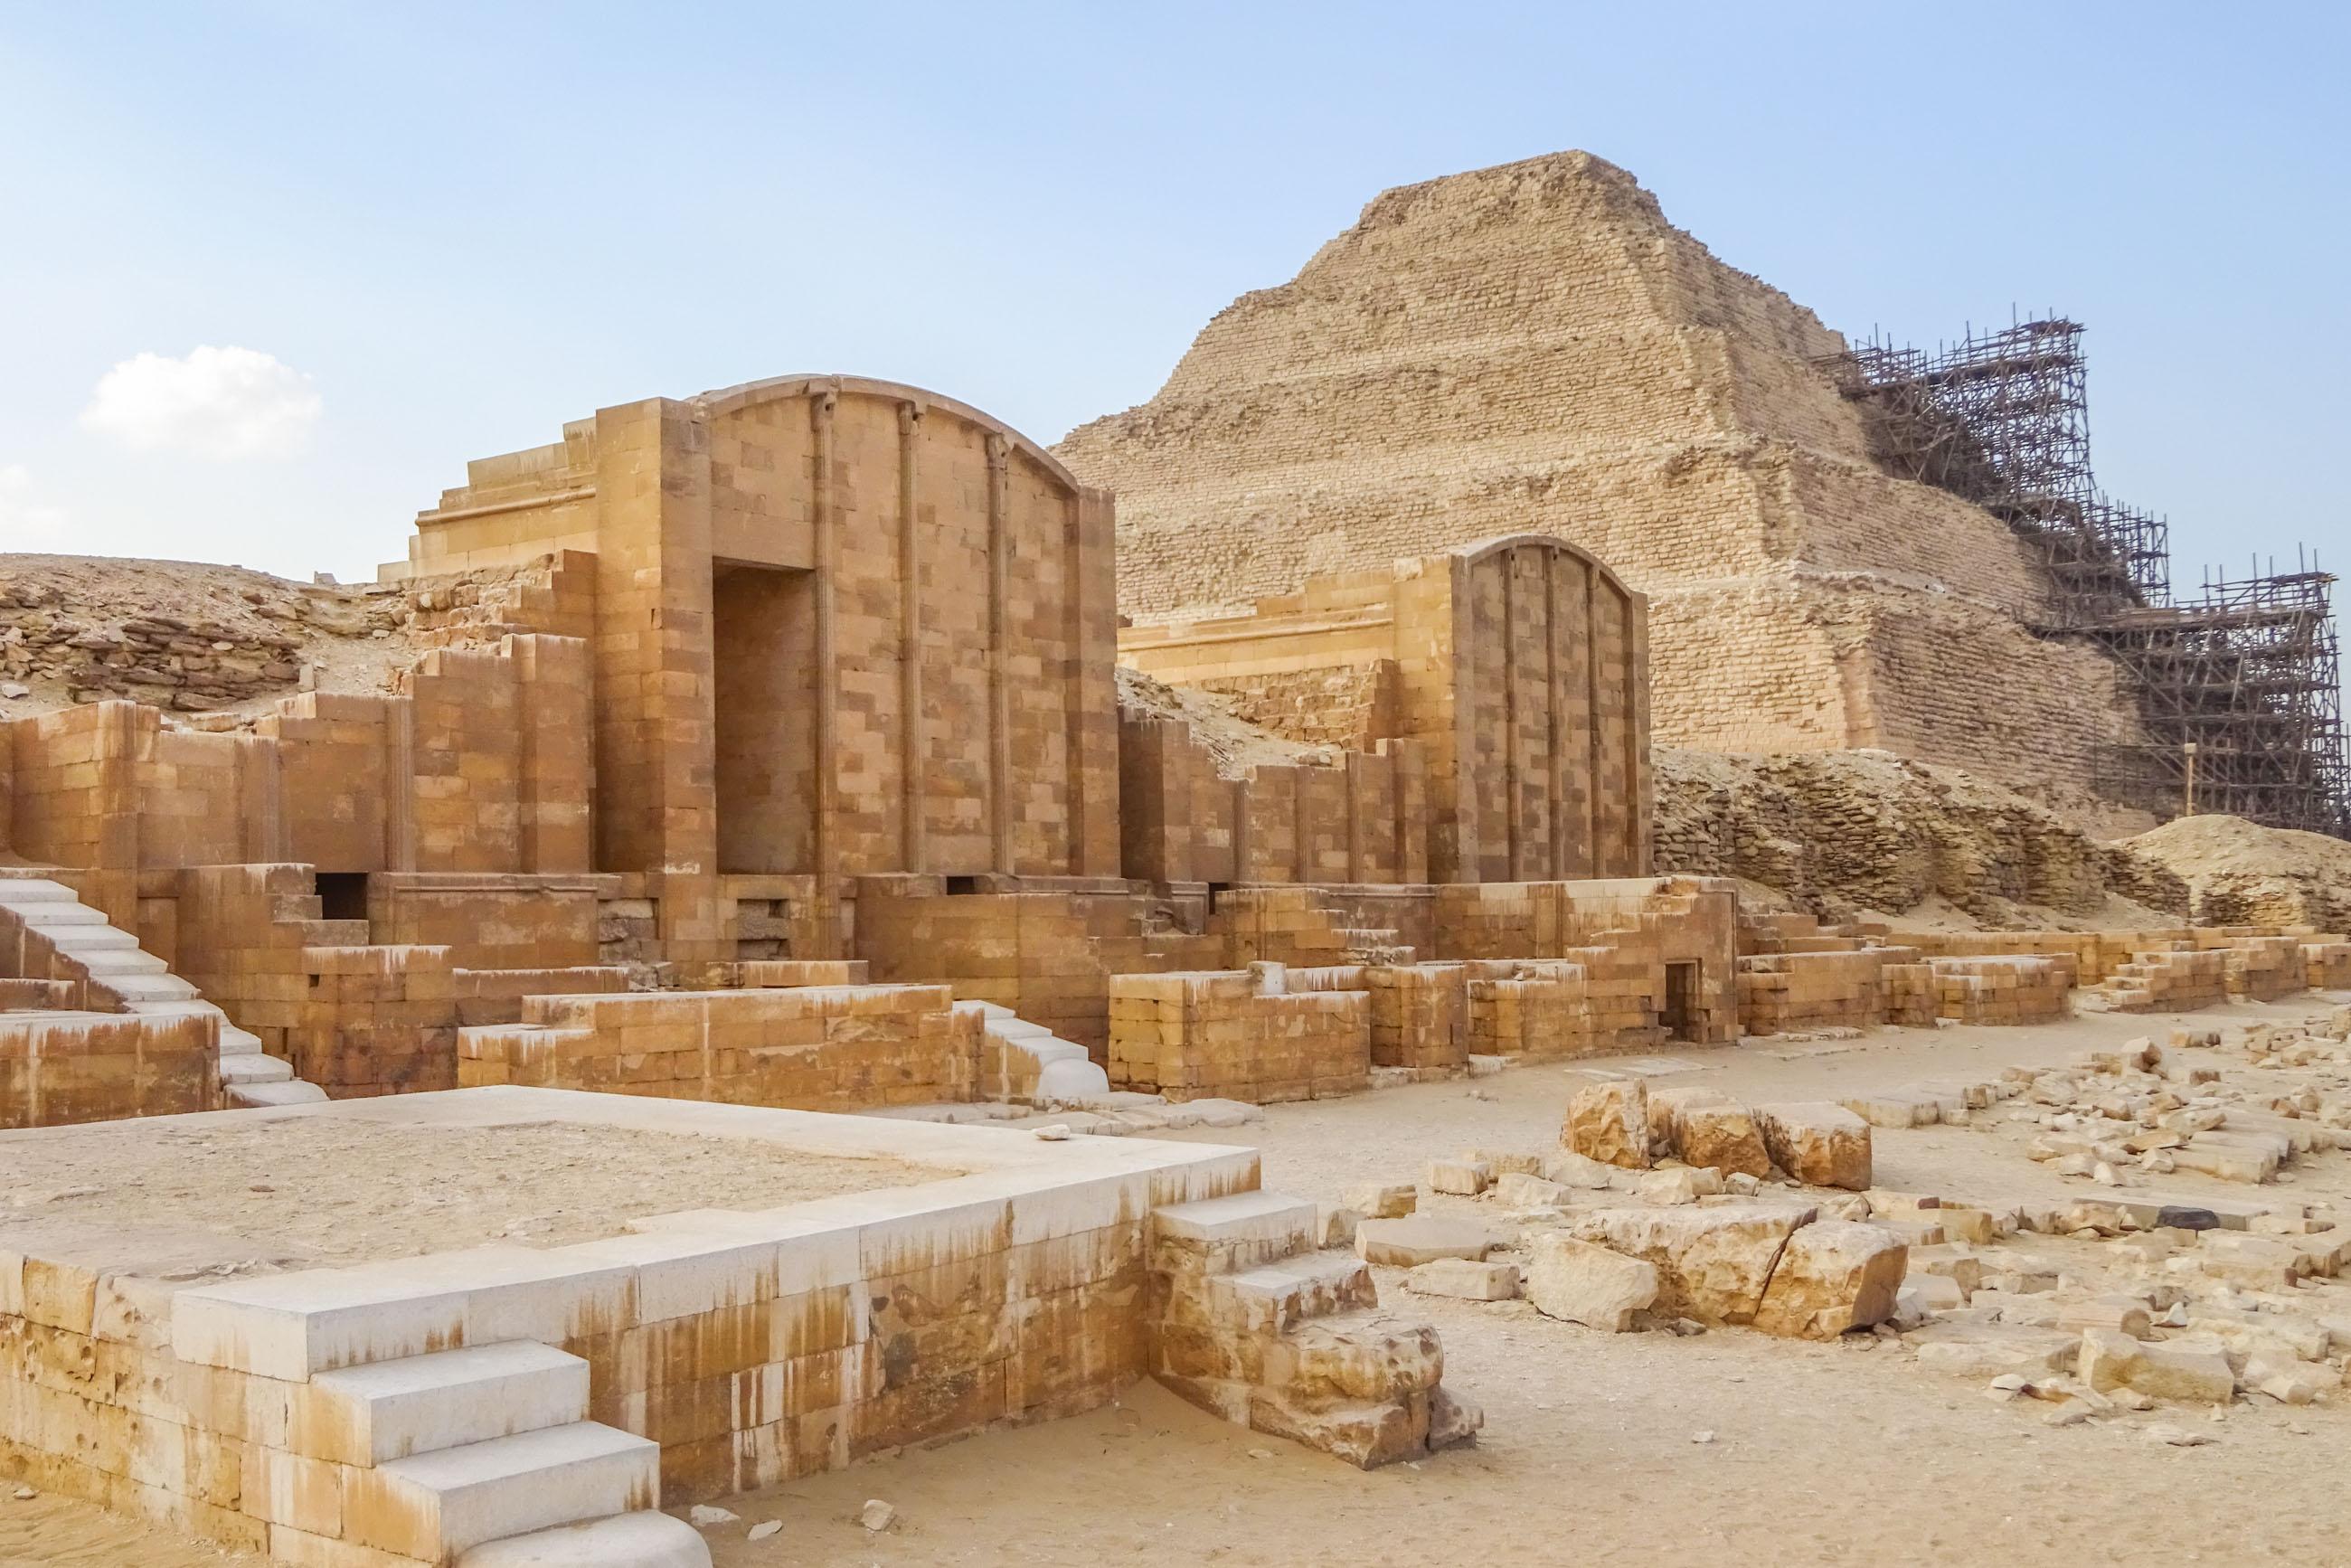 https://bubo.sk/uploads/galleries/17820/miroslavadlha_egypt_sakkara-19-.jpg